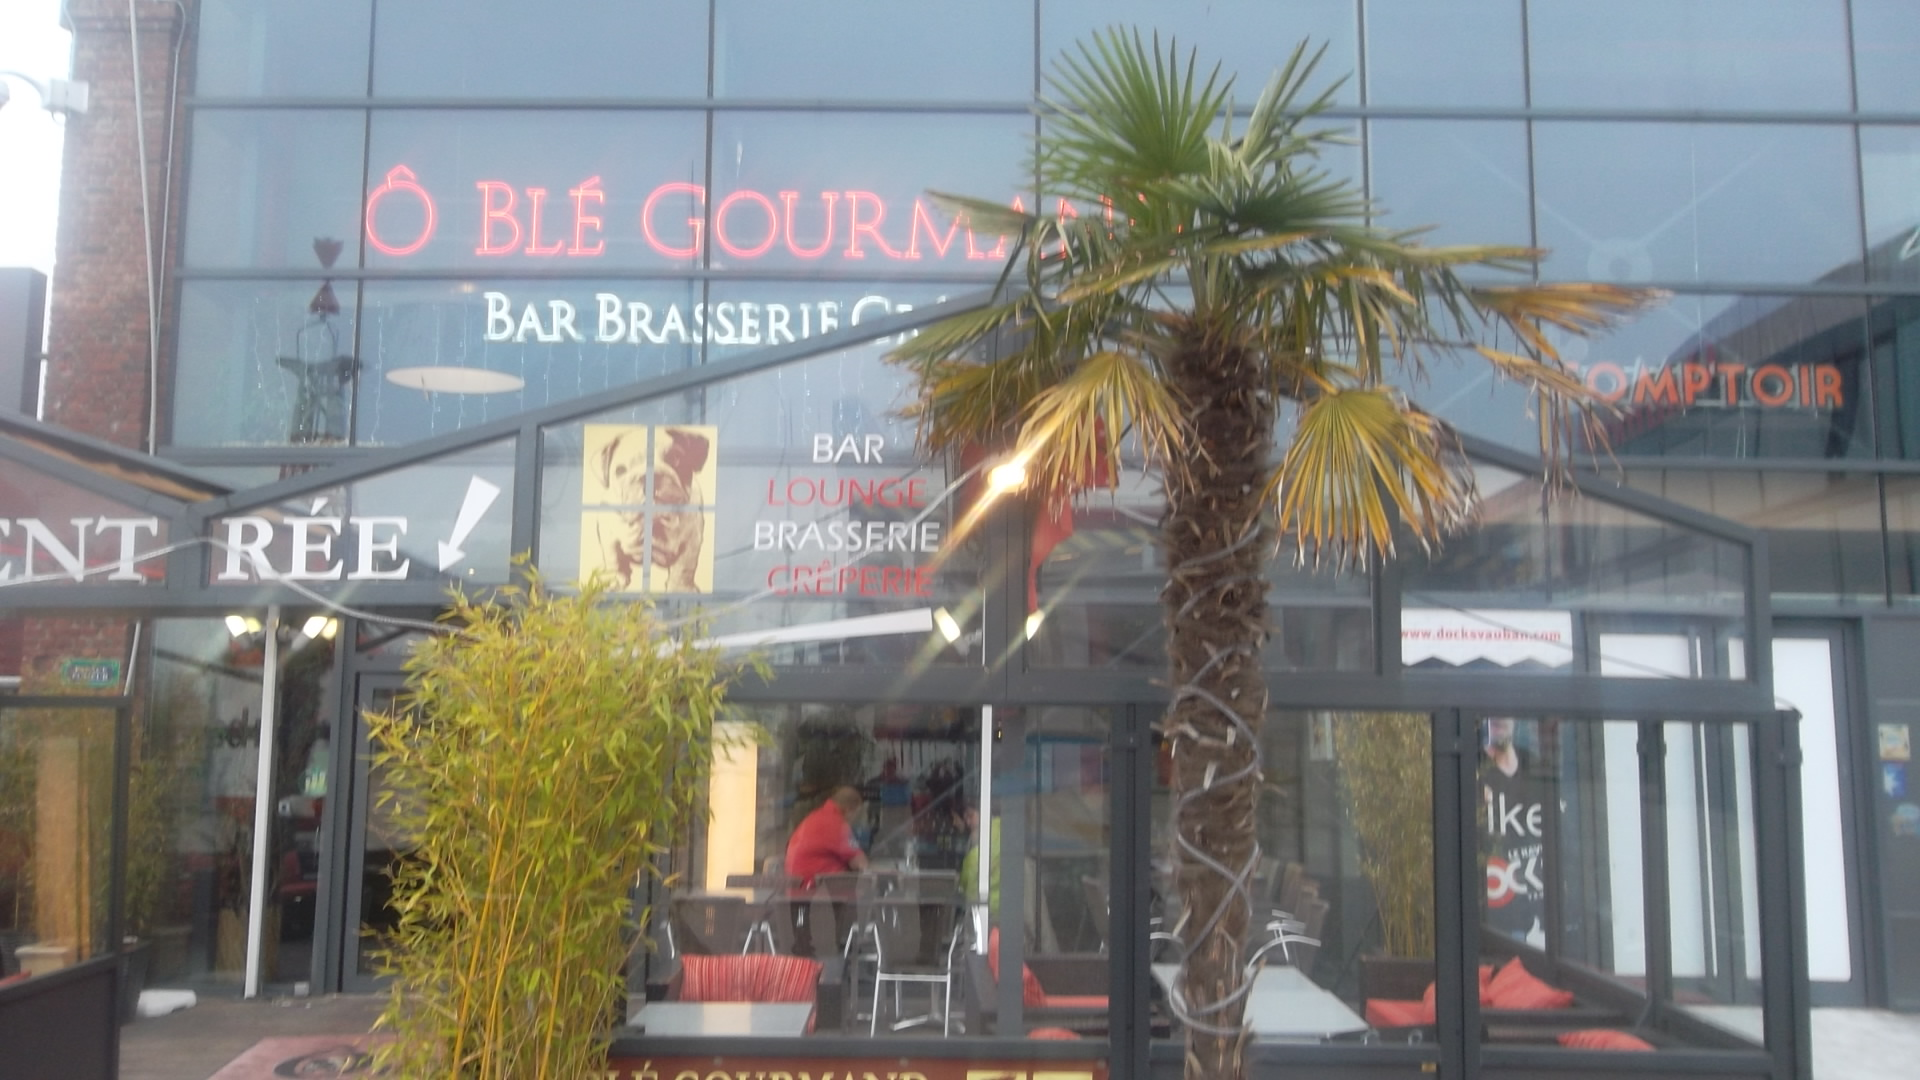 le-havre-o-ble-gourmand-docks-my13-1